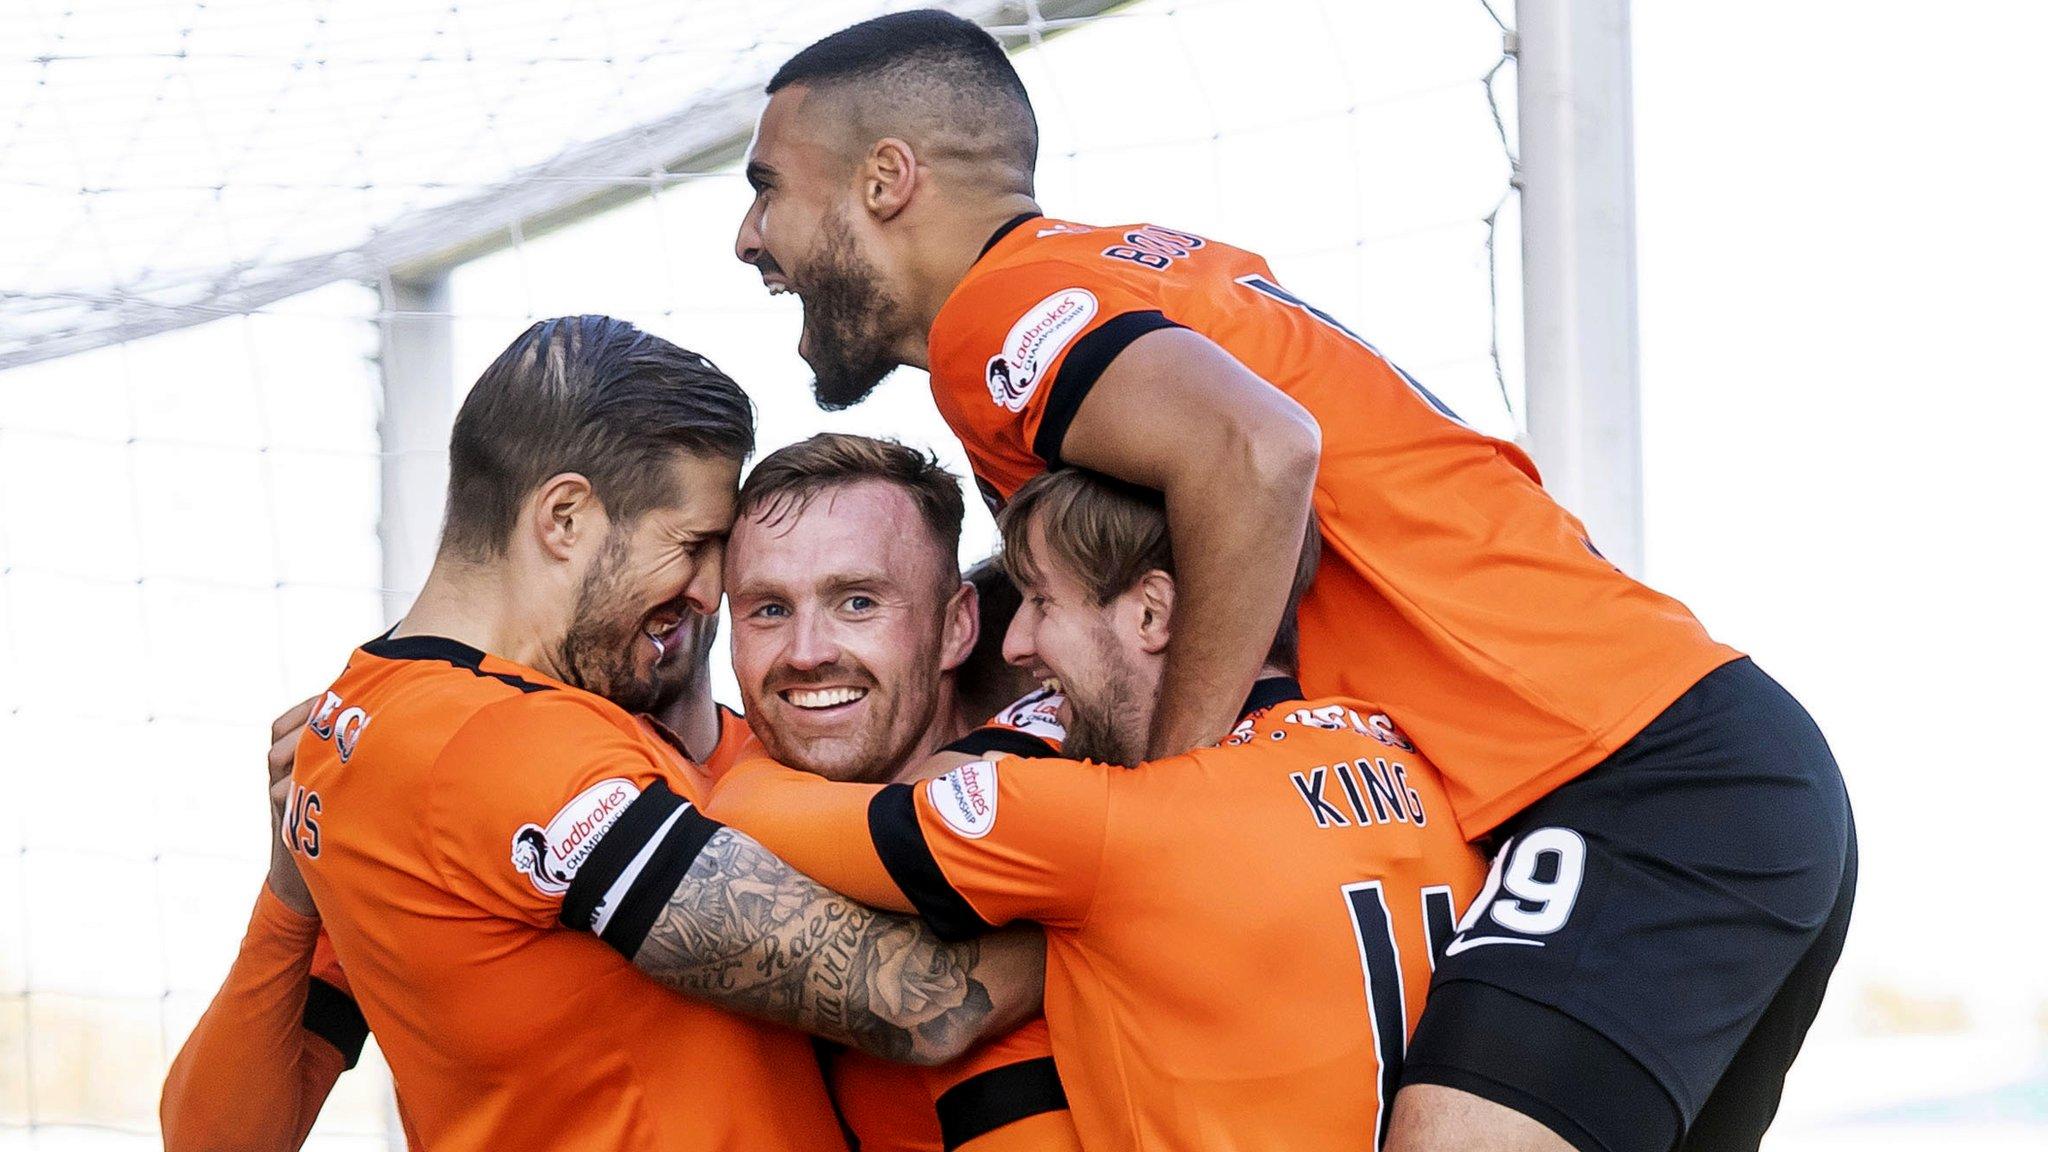 Dundee United beat Falkirk 2-0 in Scottish Championship